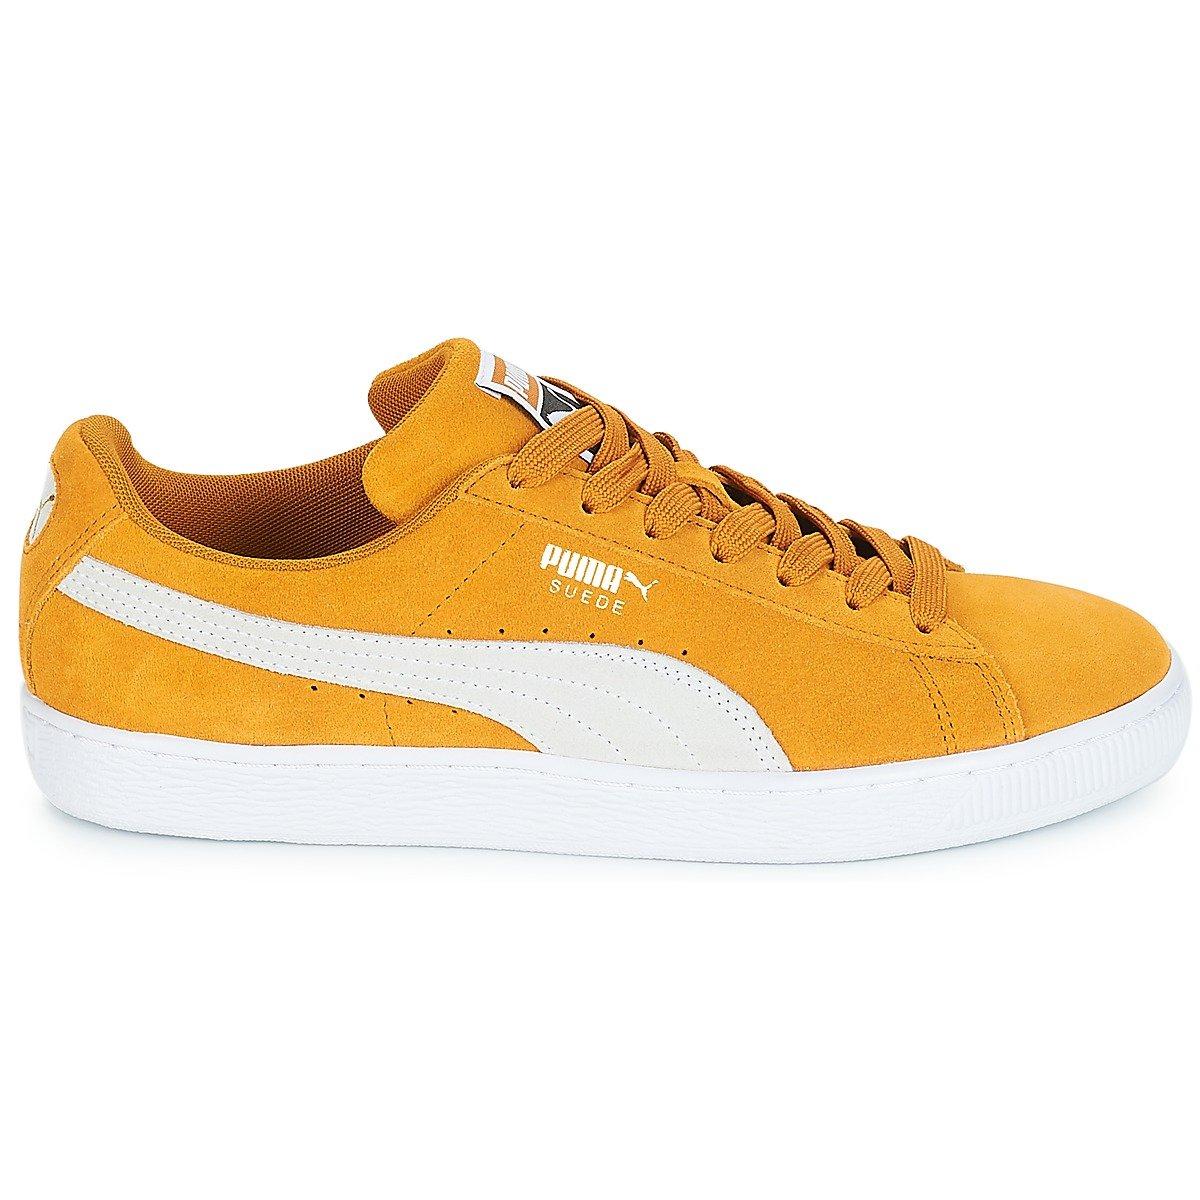 Puma Unisex-Erwachsene Unisex-Erwachsene Puma Suede Classic Sneaker, Gelb 29f197